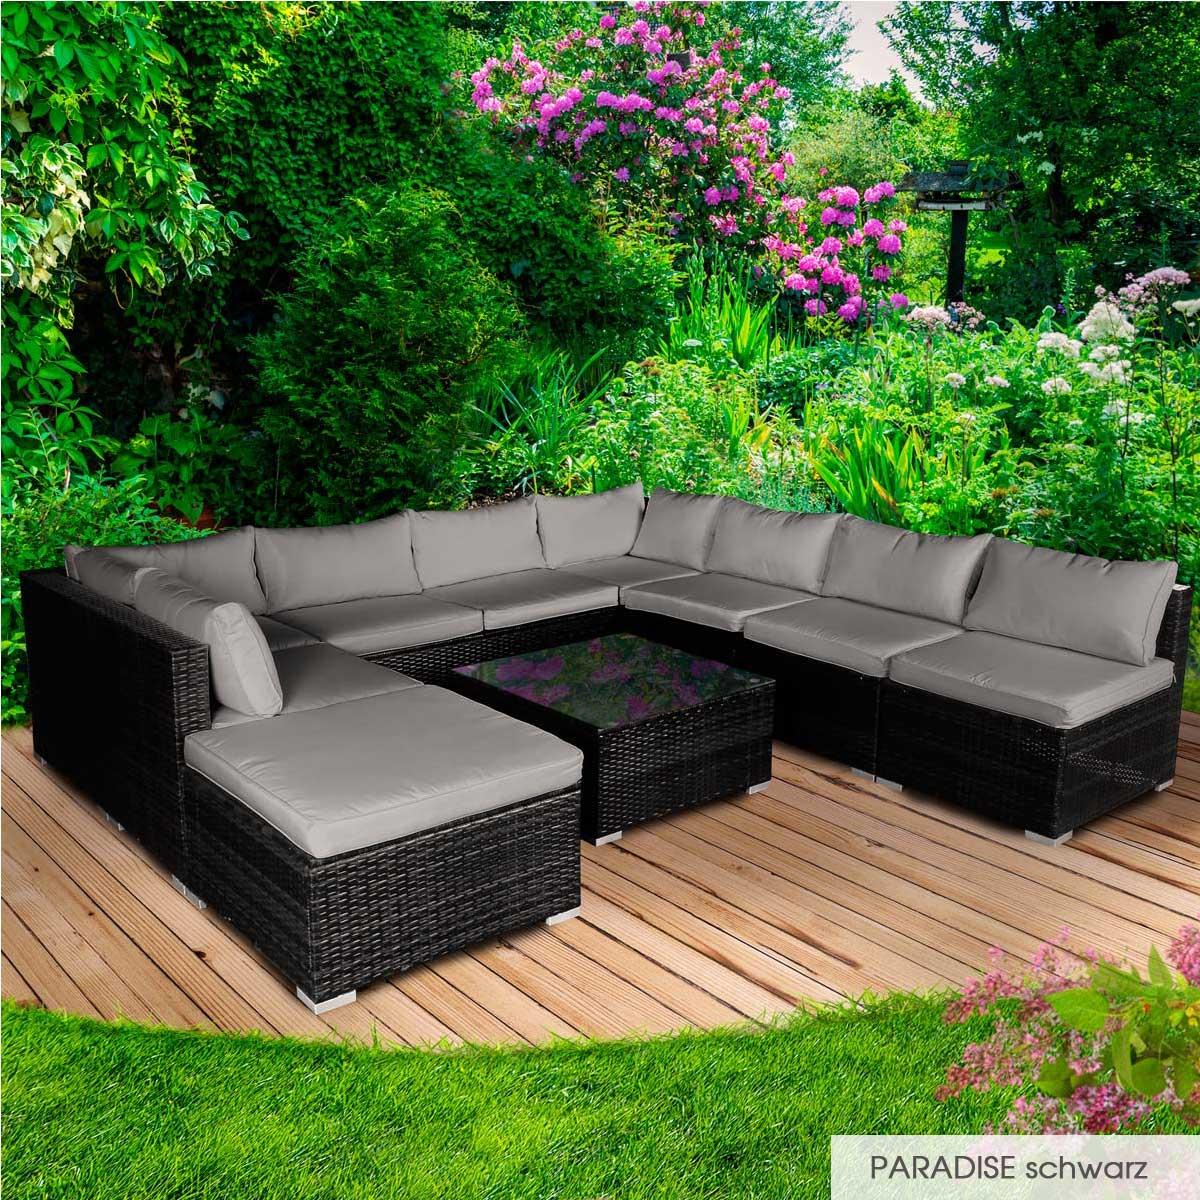 Gartenmoebel-Poly-Rattan-Lounge-Moebel-Sitzgarnitur-Gartengarnitur-Sitzgruppe-Sofa Indexbild 37